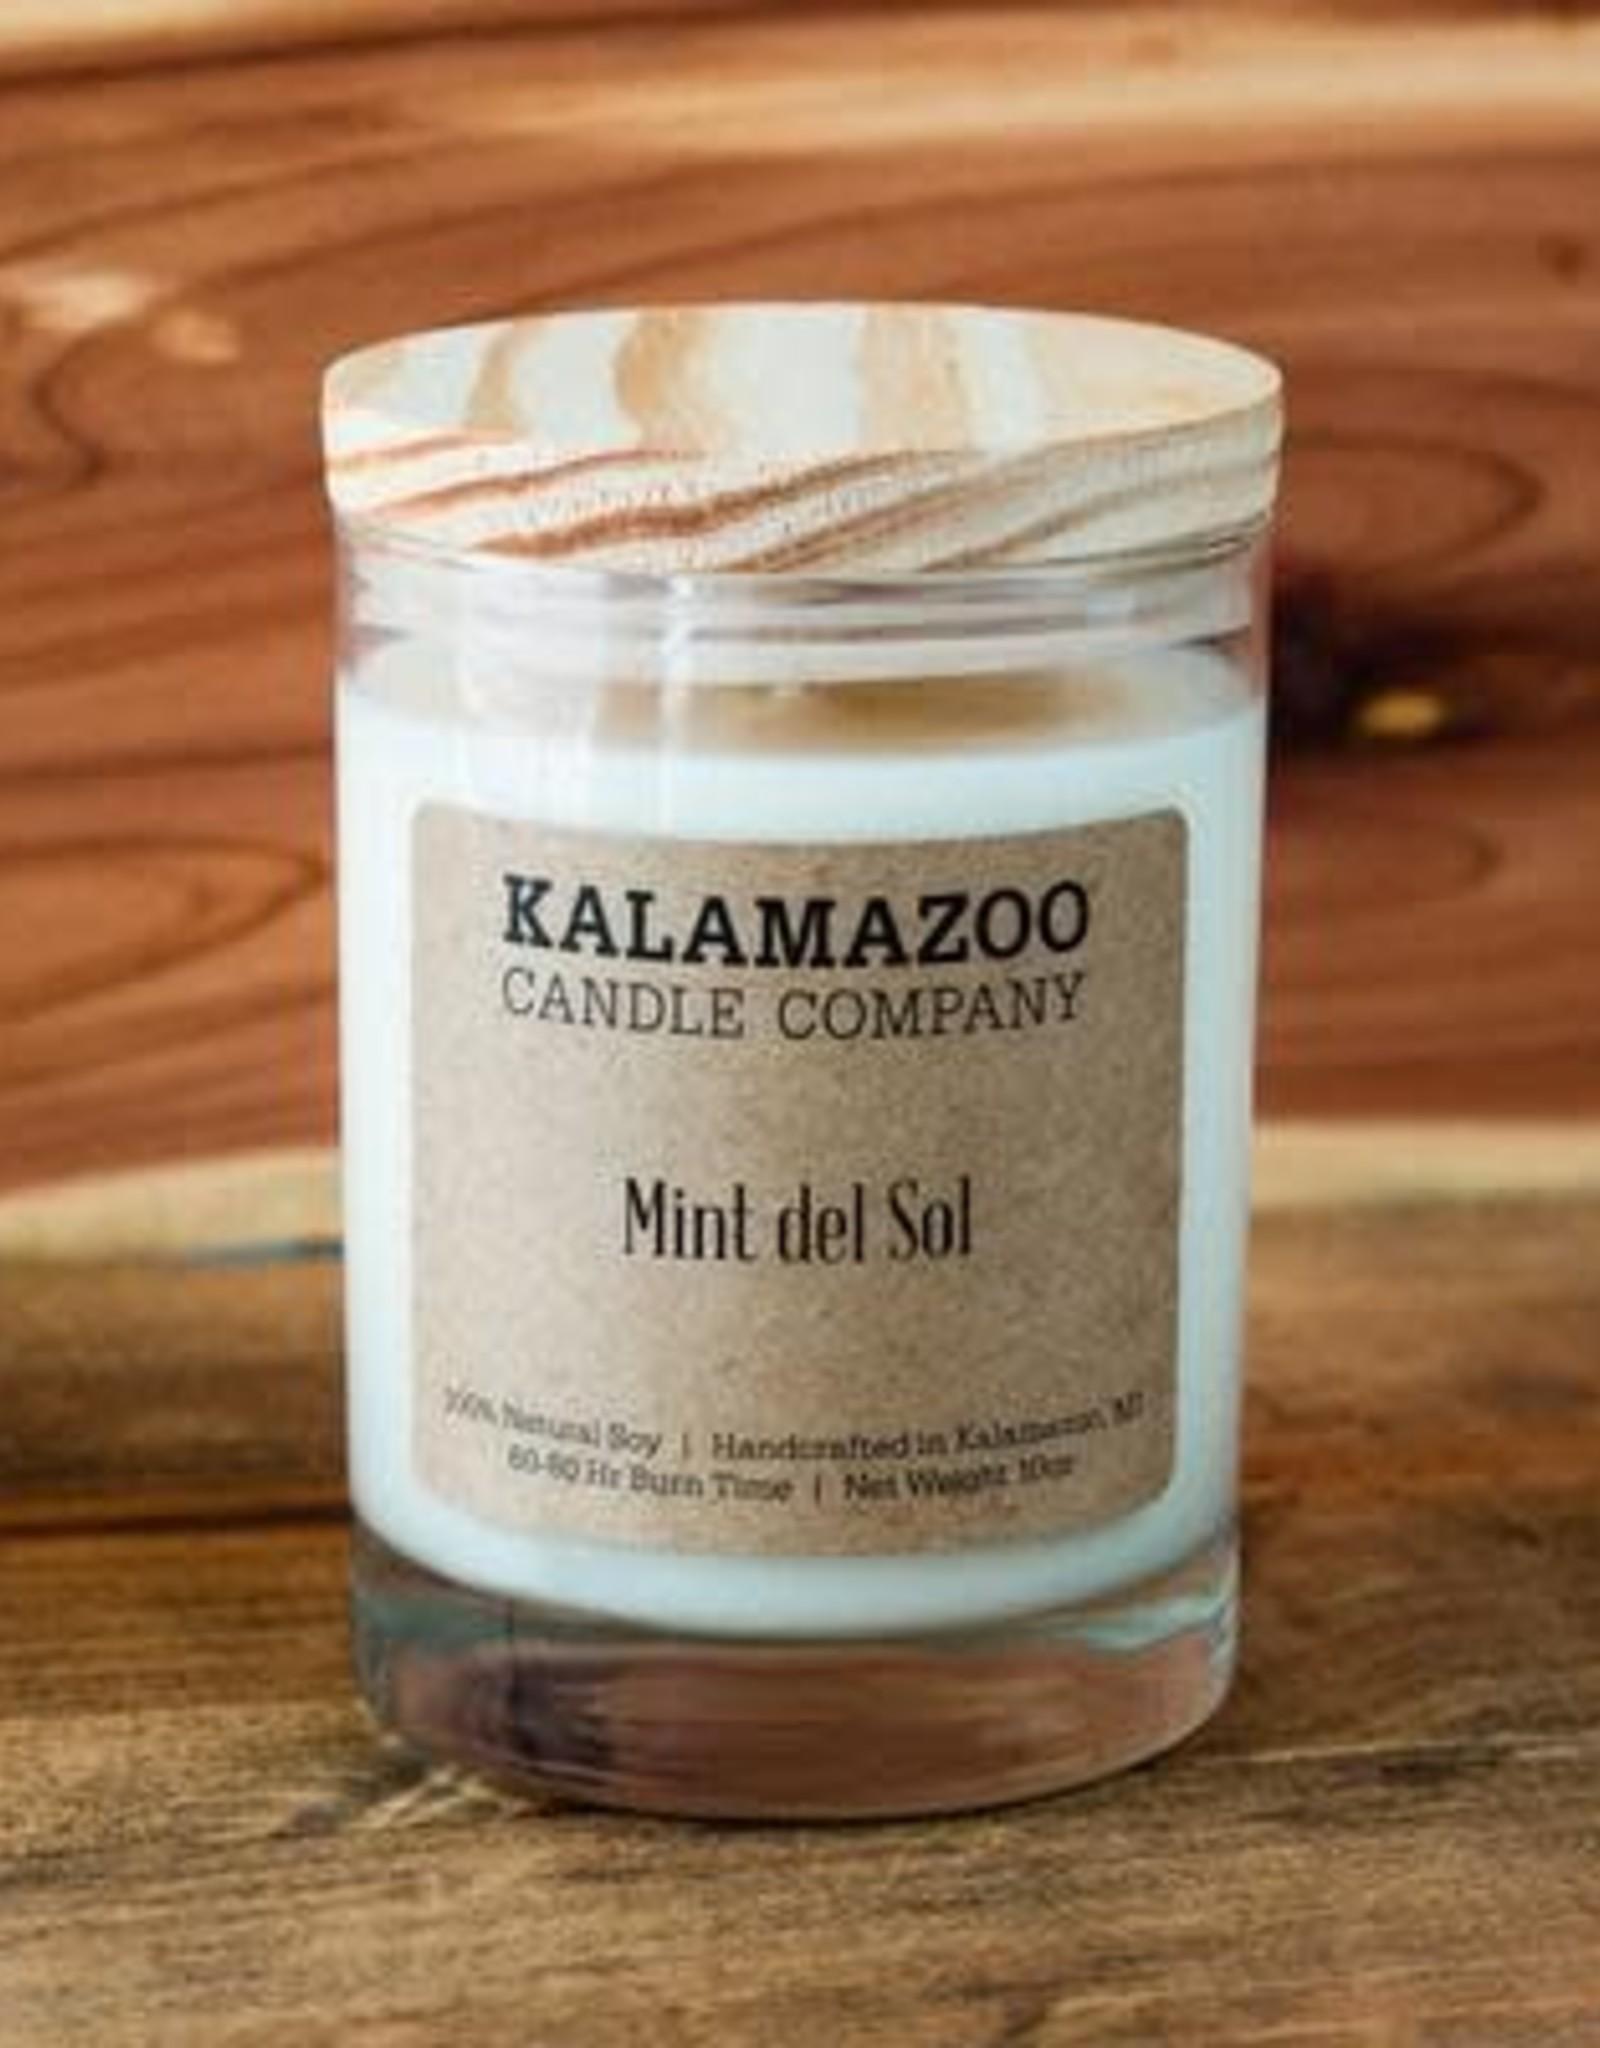 Kalamazoo Candle Co. Kalamazoo Candle Co. 10oz Jar   Mint Del Sol